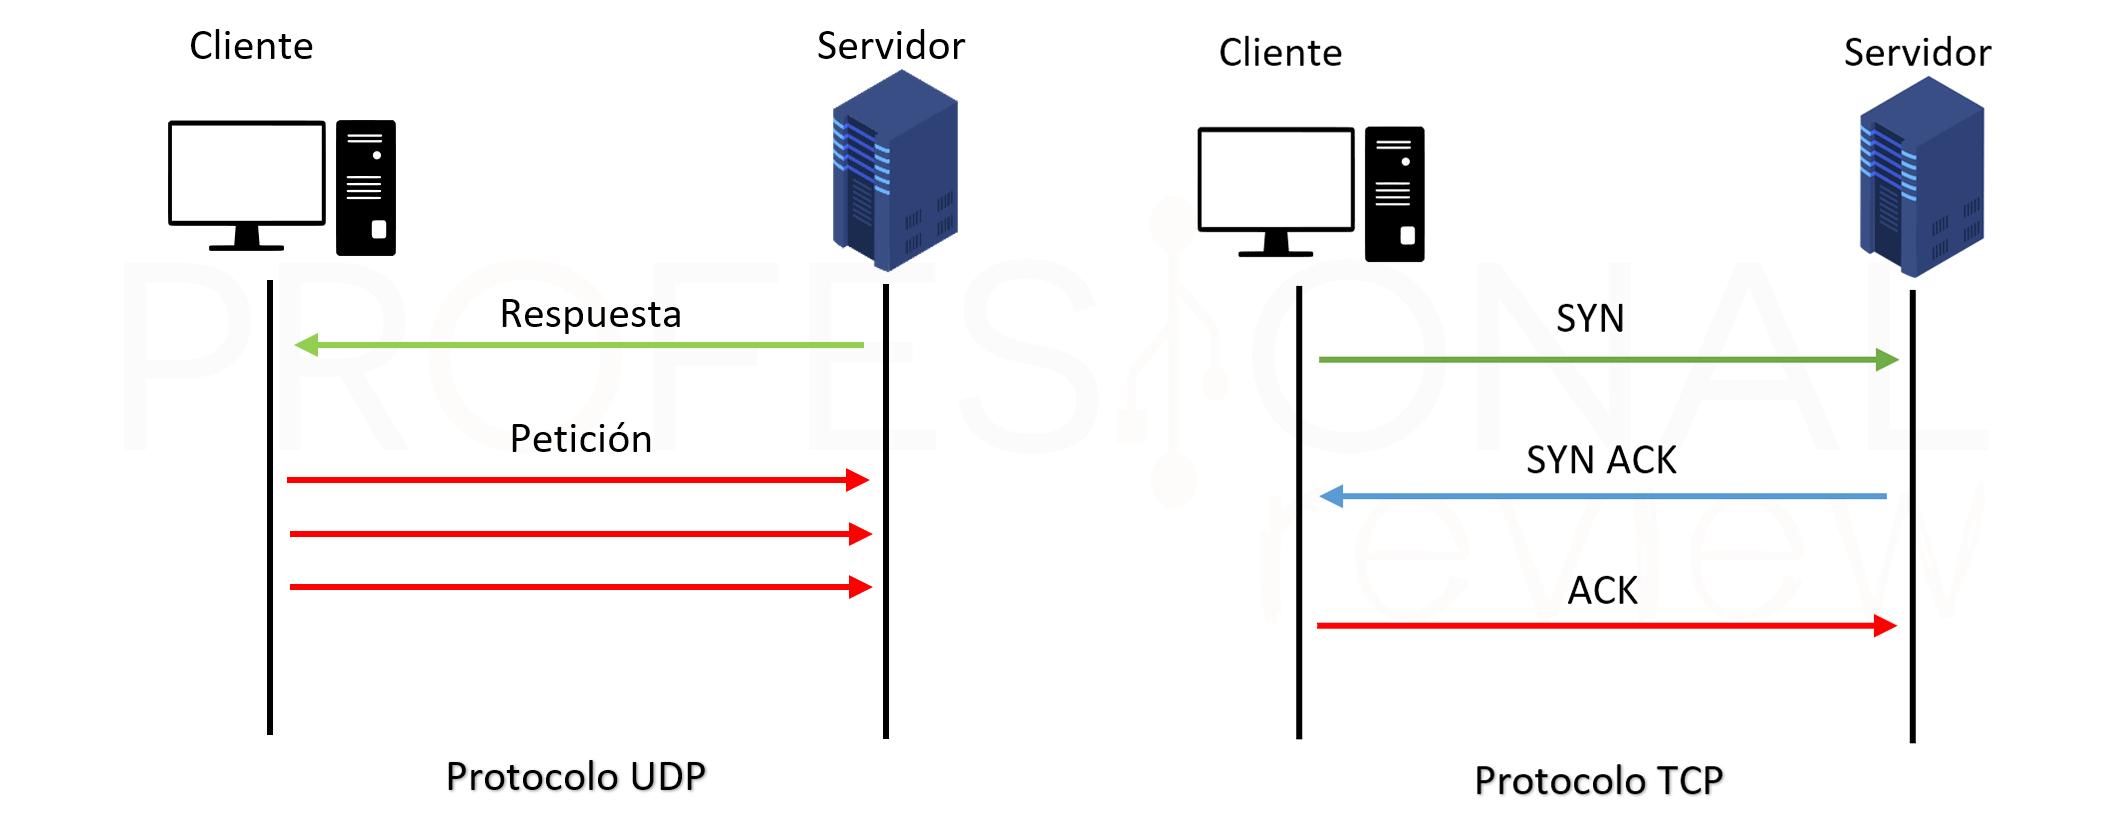 Protocolo TCP vs UDP